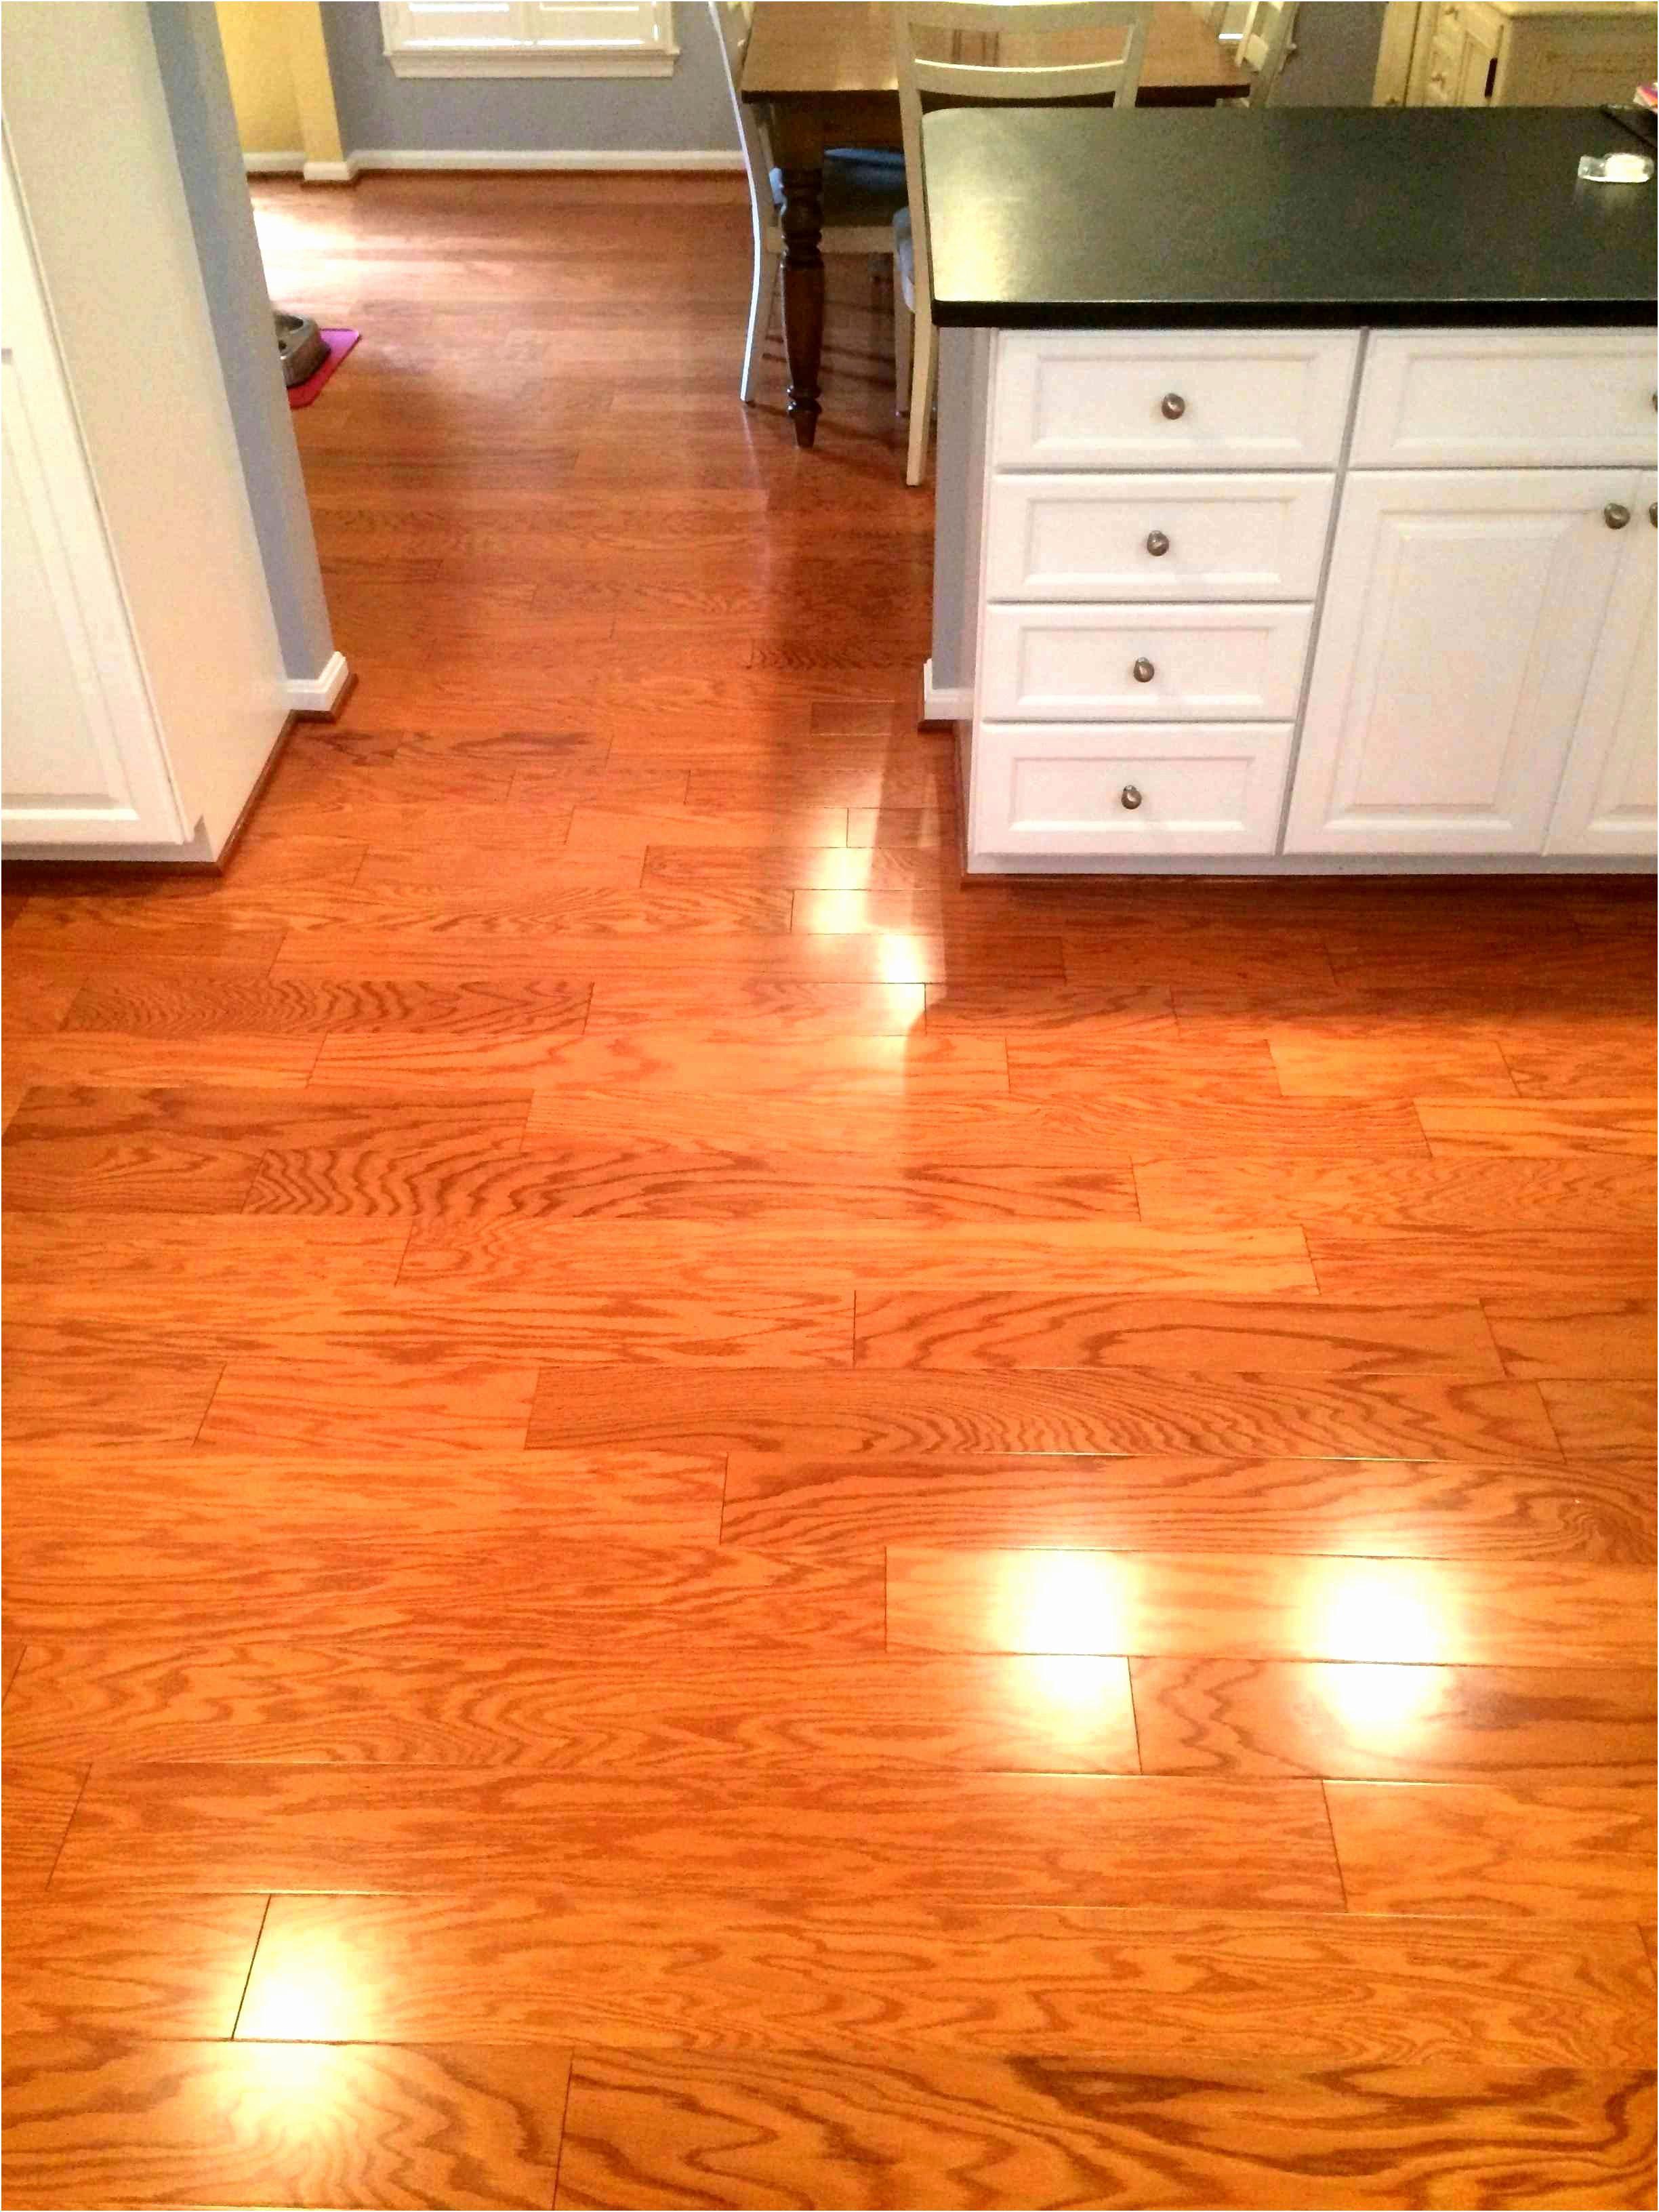 oak hardwood flooring stains of 10 diy wood flooring collections economyinnbeebe com in bruce flooring best where to hardwood flooring inspirational 0d grace place barnegat